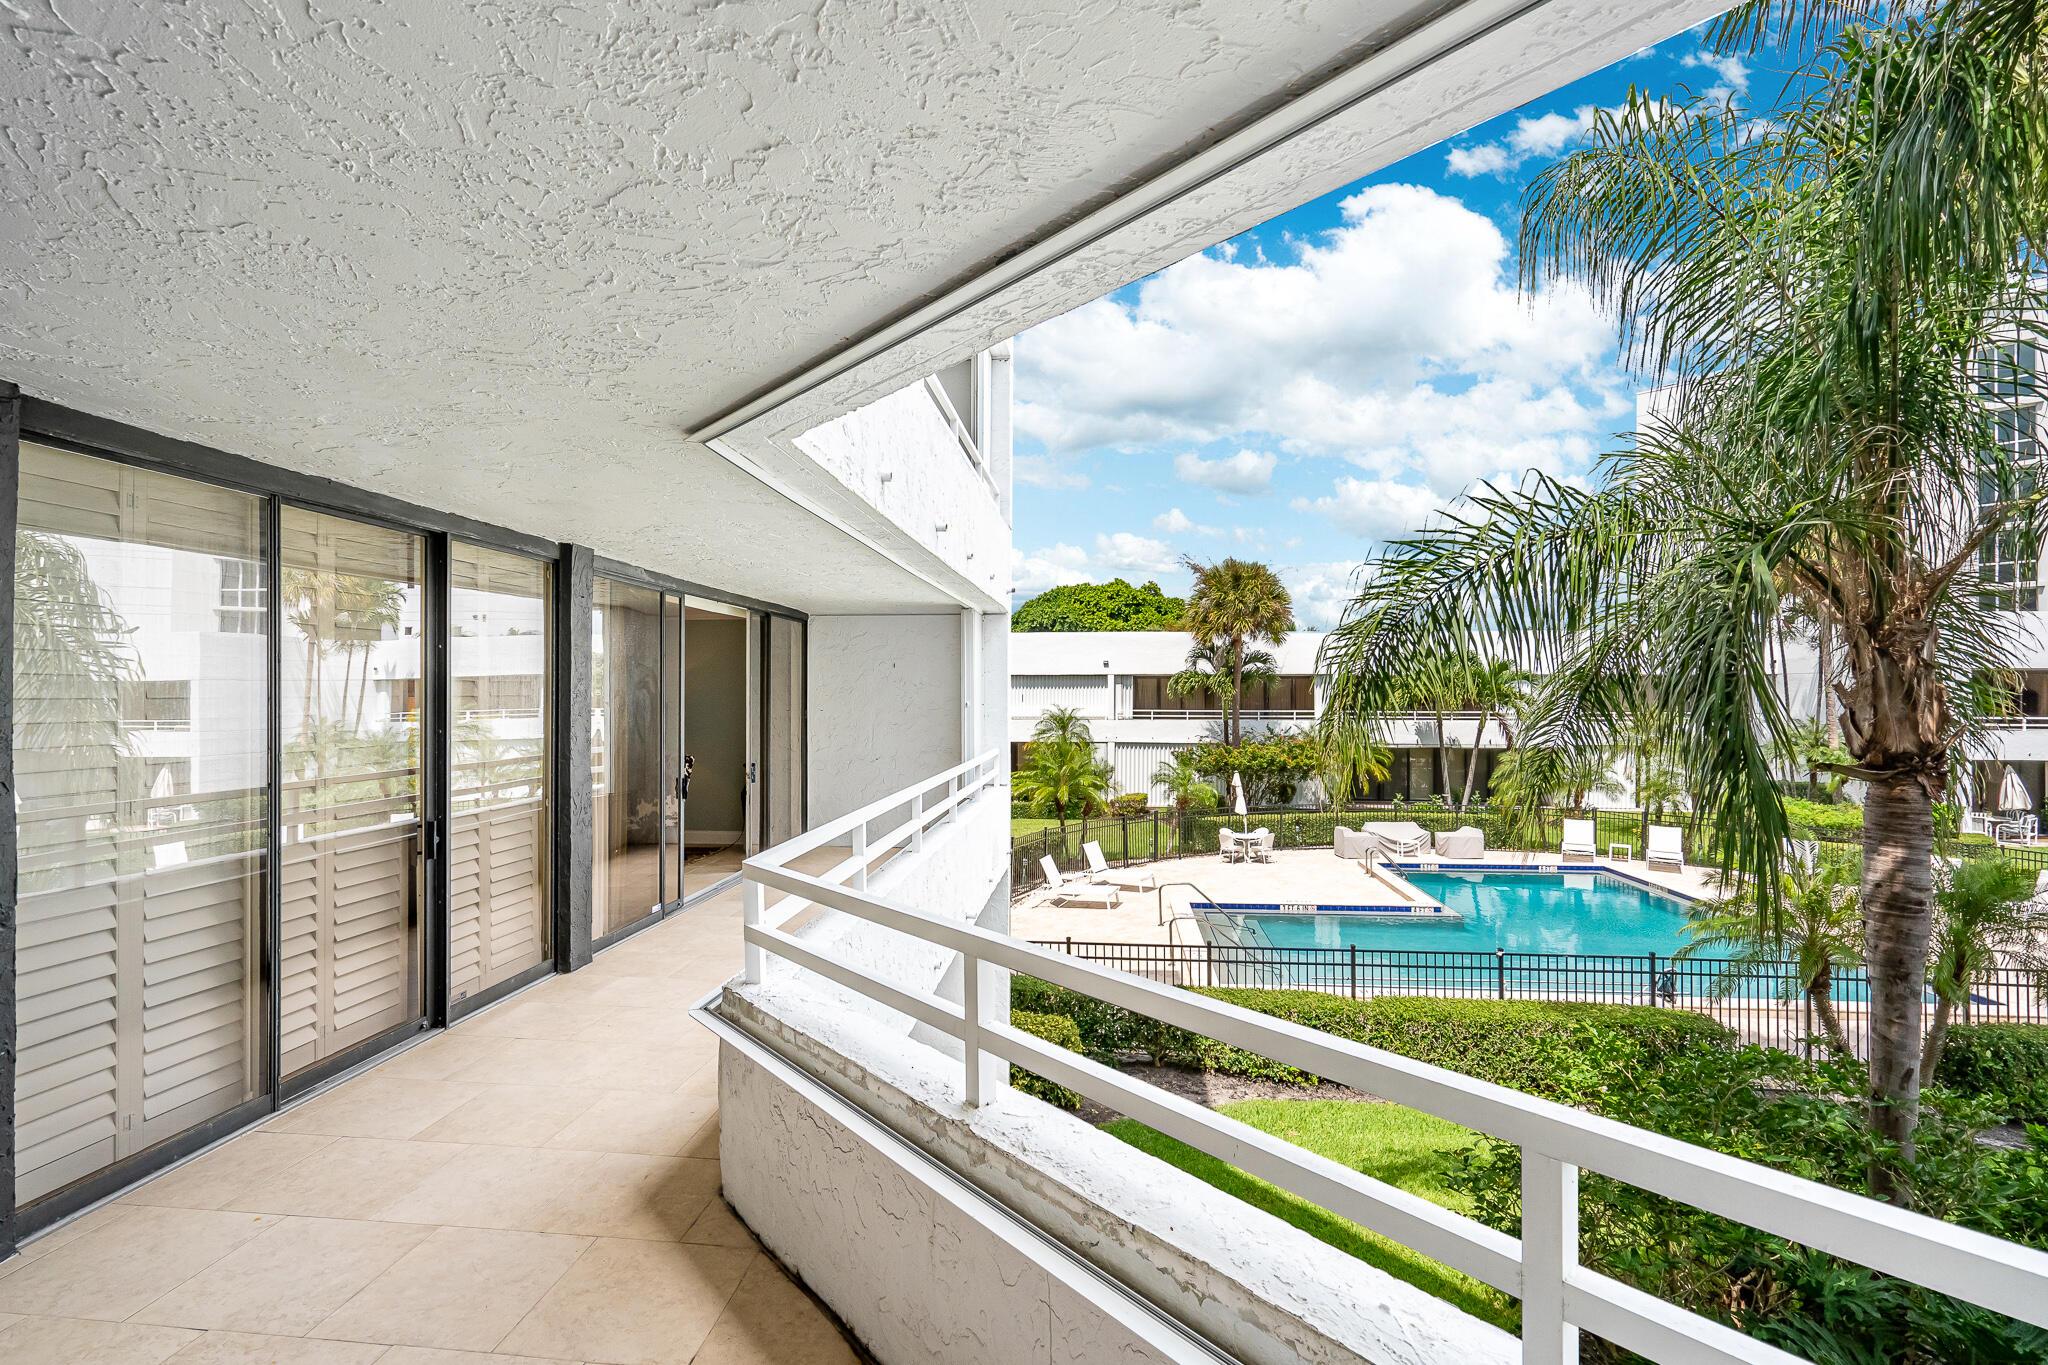 3701 S Flagler Drive B204 West Palm Beach, FL 33405 photo 26